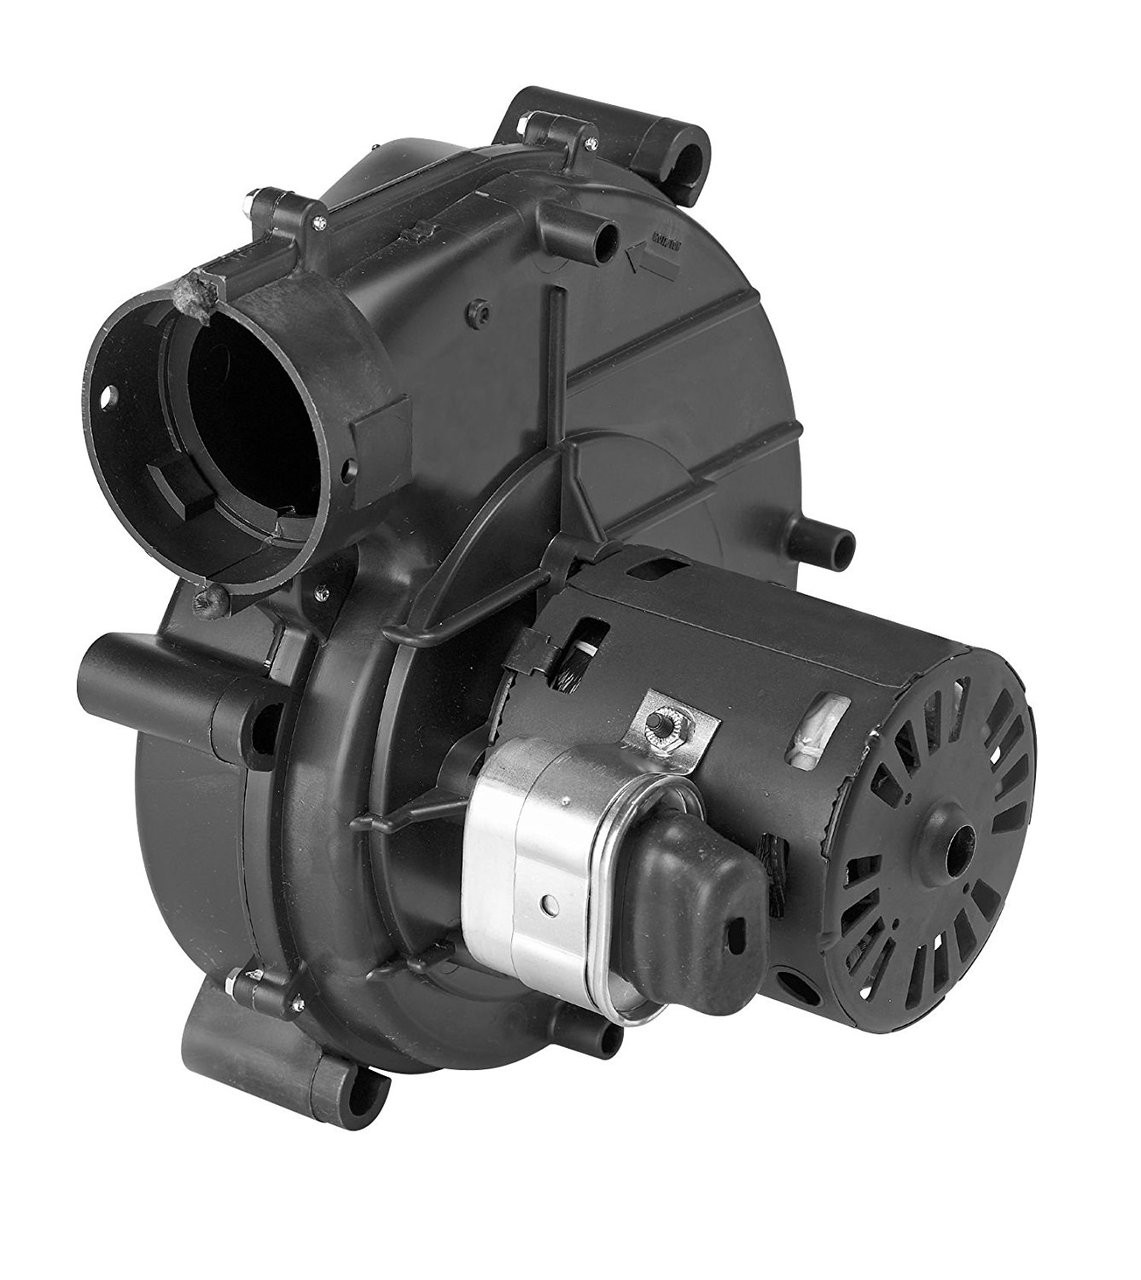 york ducane furnace draft inducer 7062 5019 7062 3136 115v fasco a168 [ 1141 x 1280 Pixel ]